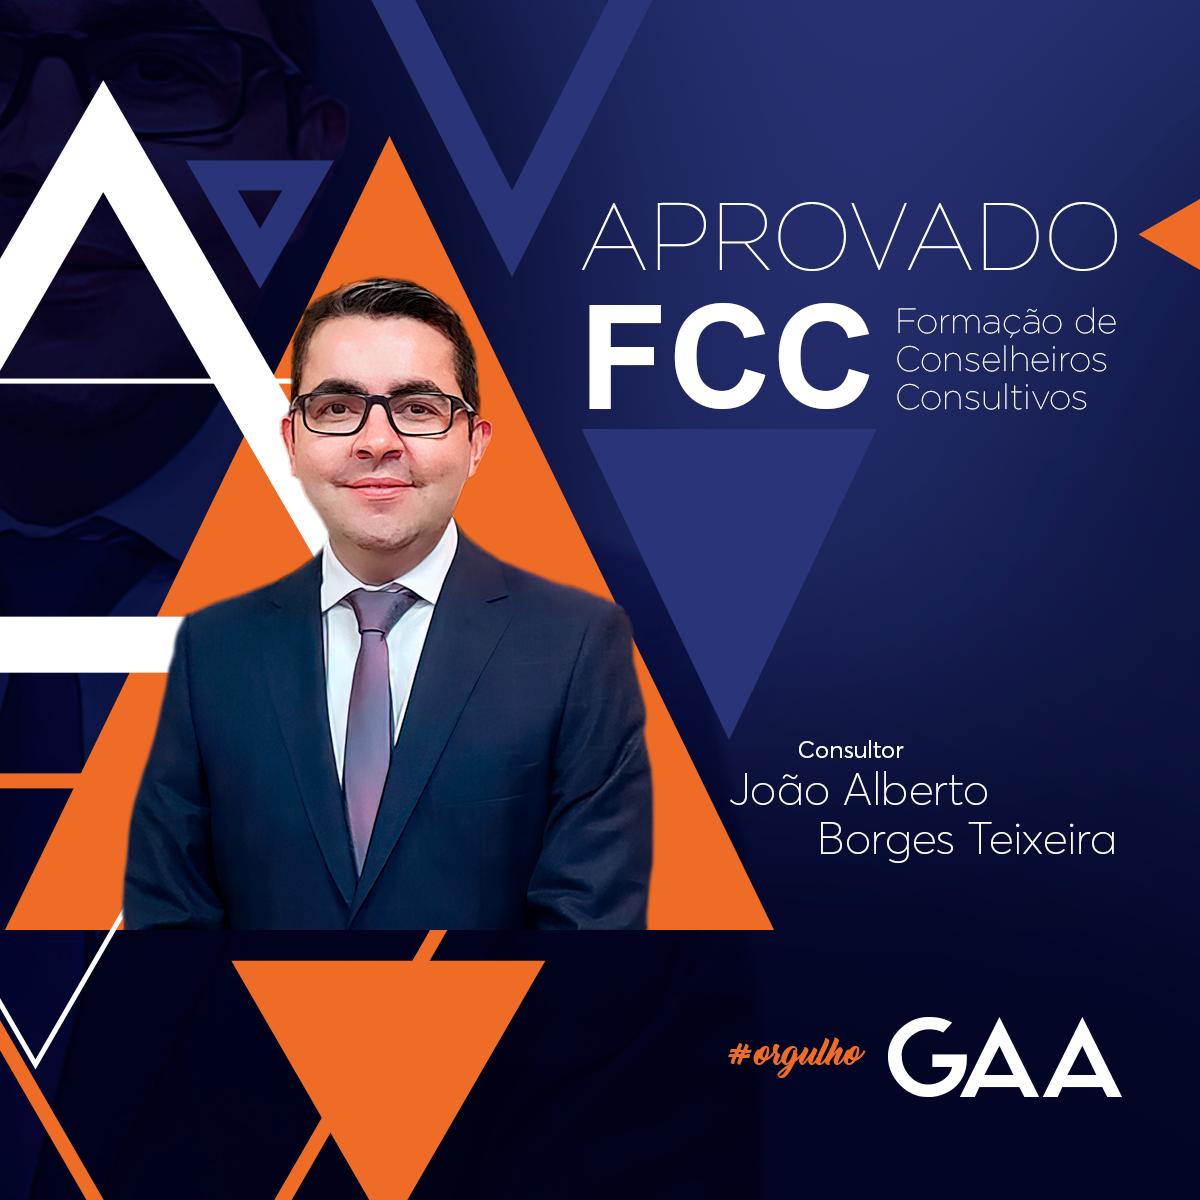 Orgulho GAA – Certificado FCC